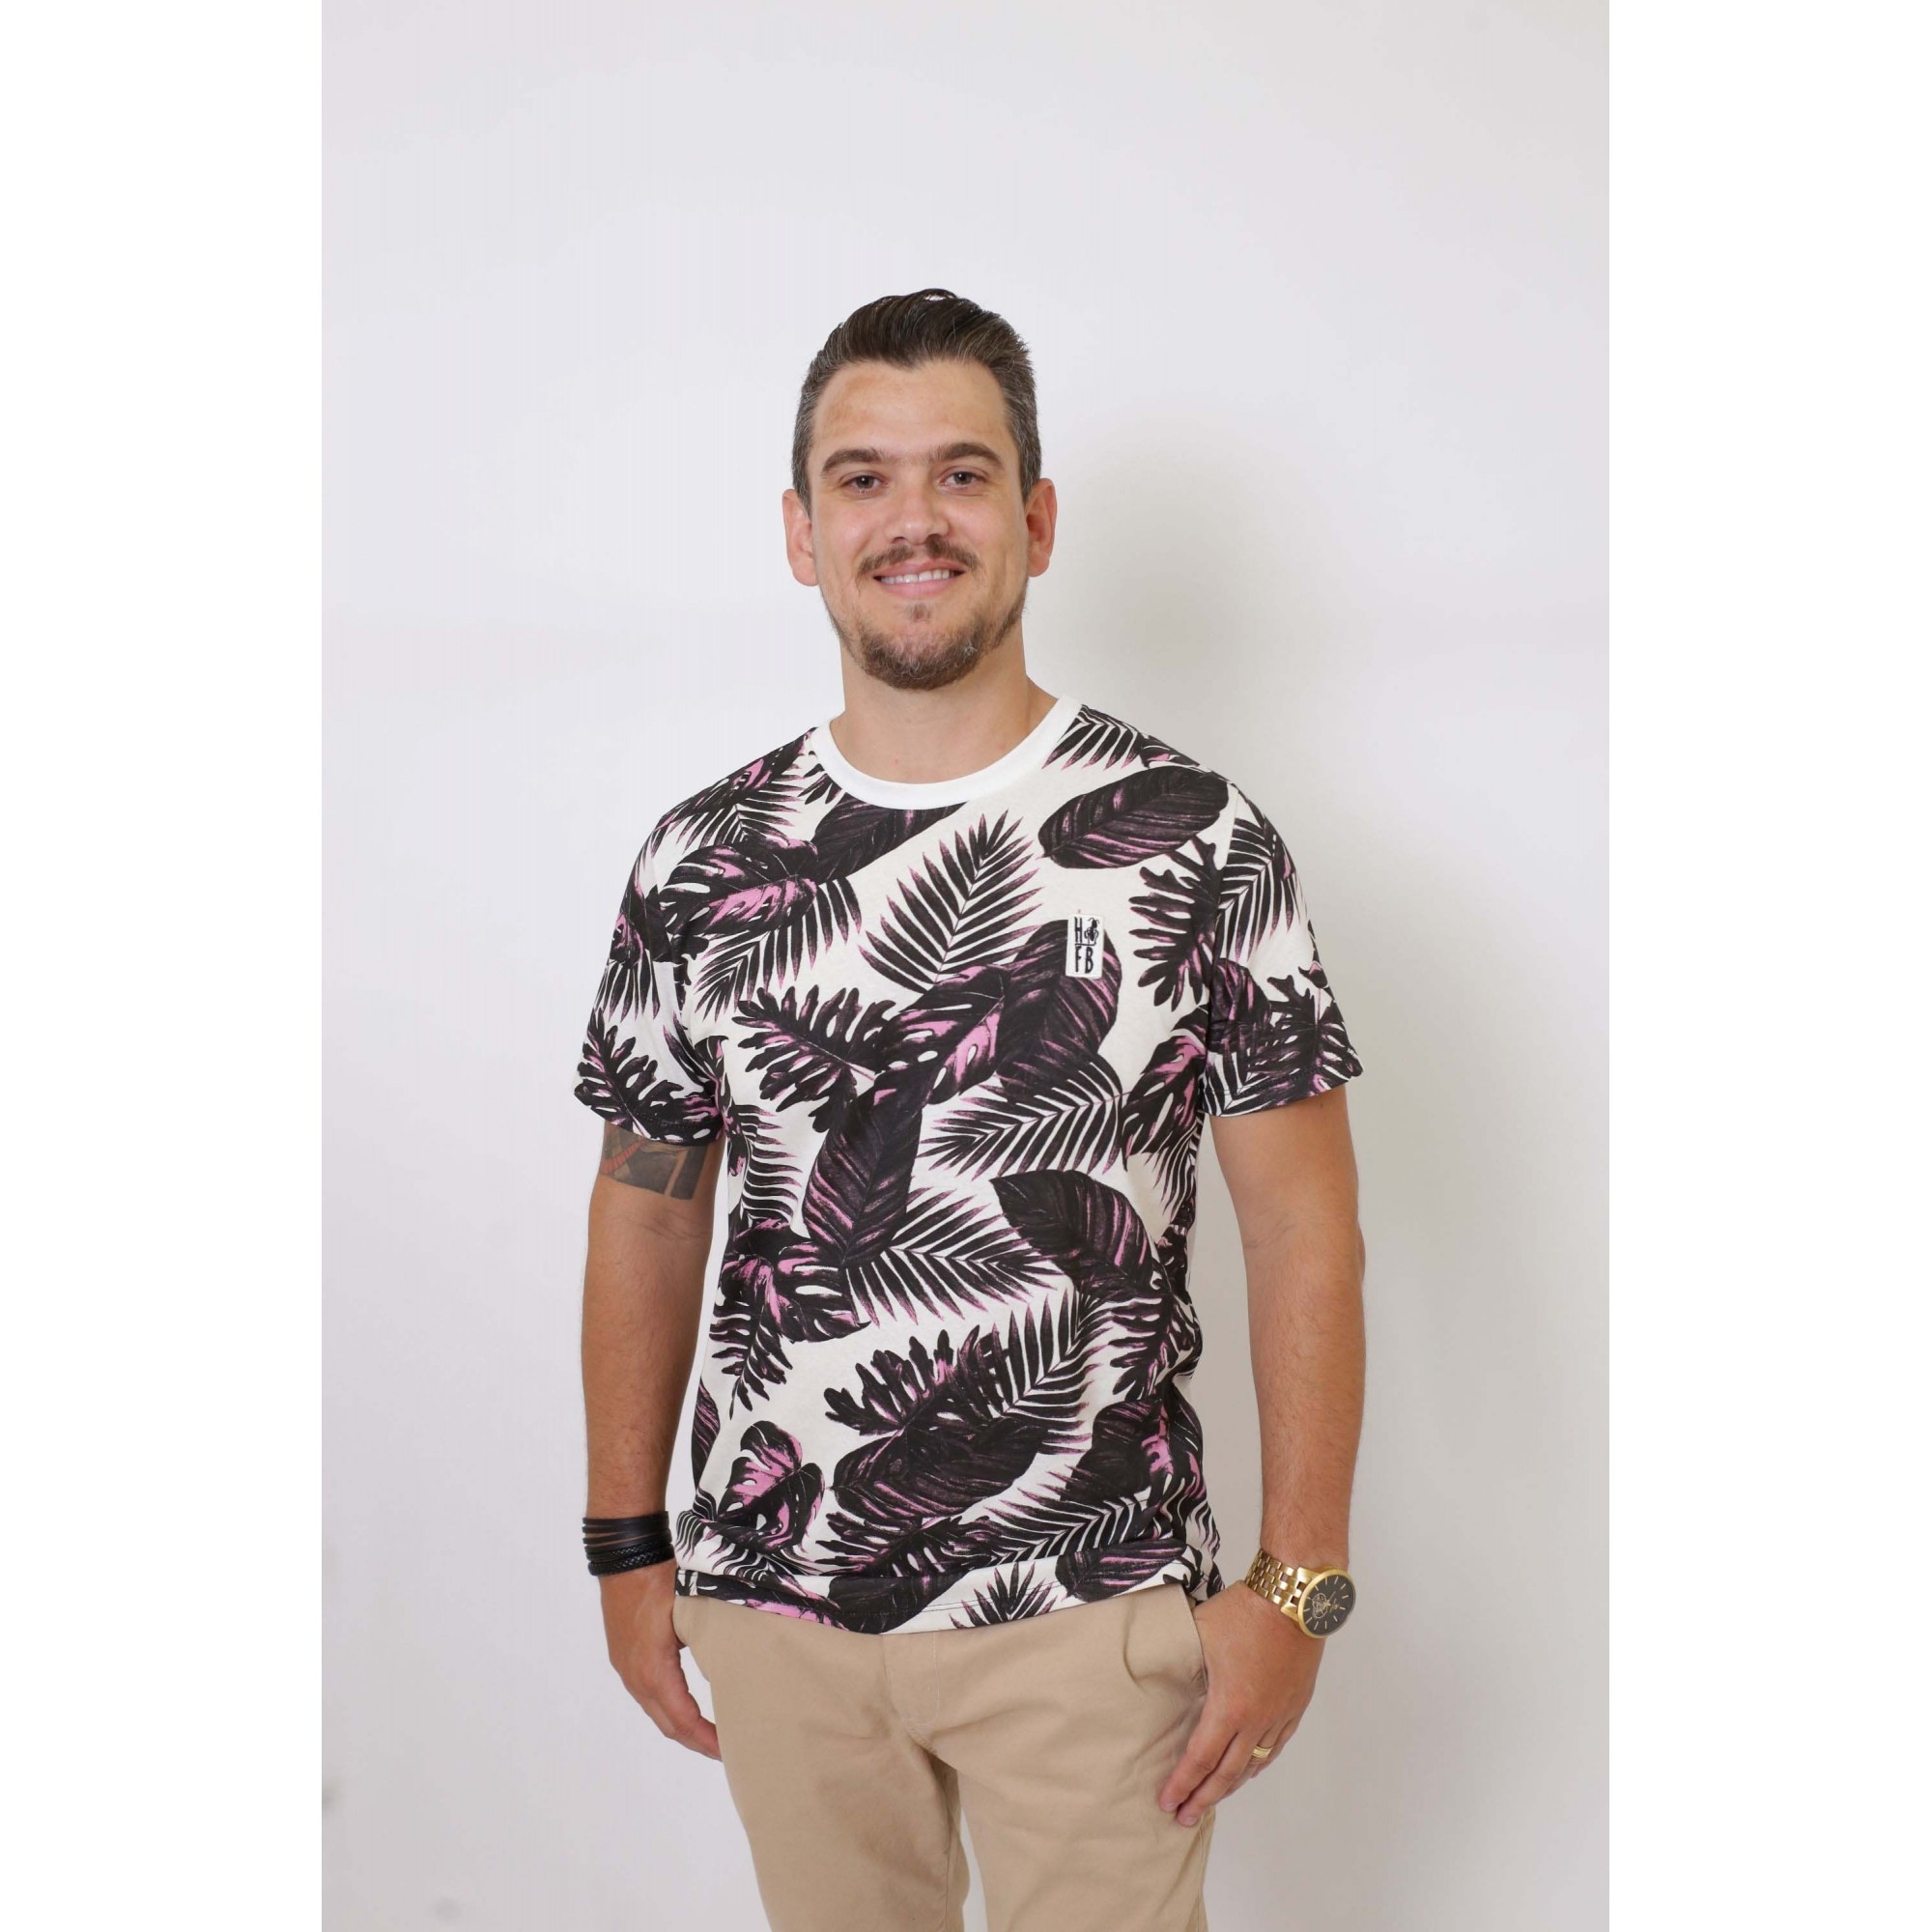 PAI E FILHA > 02 T-Shirts - Cancún  [Coleção Tal Pai Tal Filha]  - Heitor Fashion Brazil